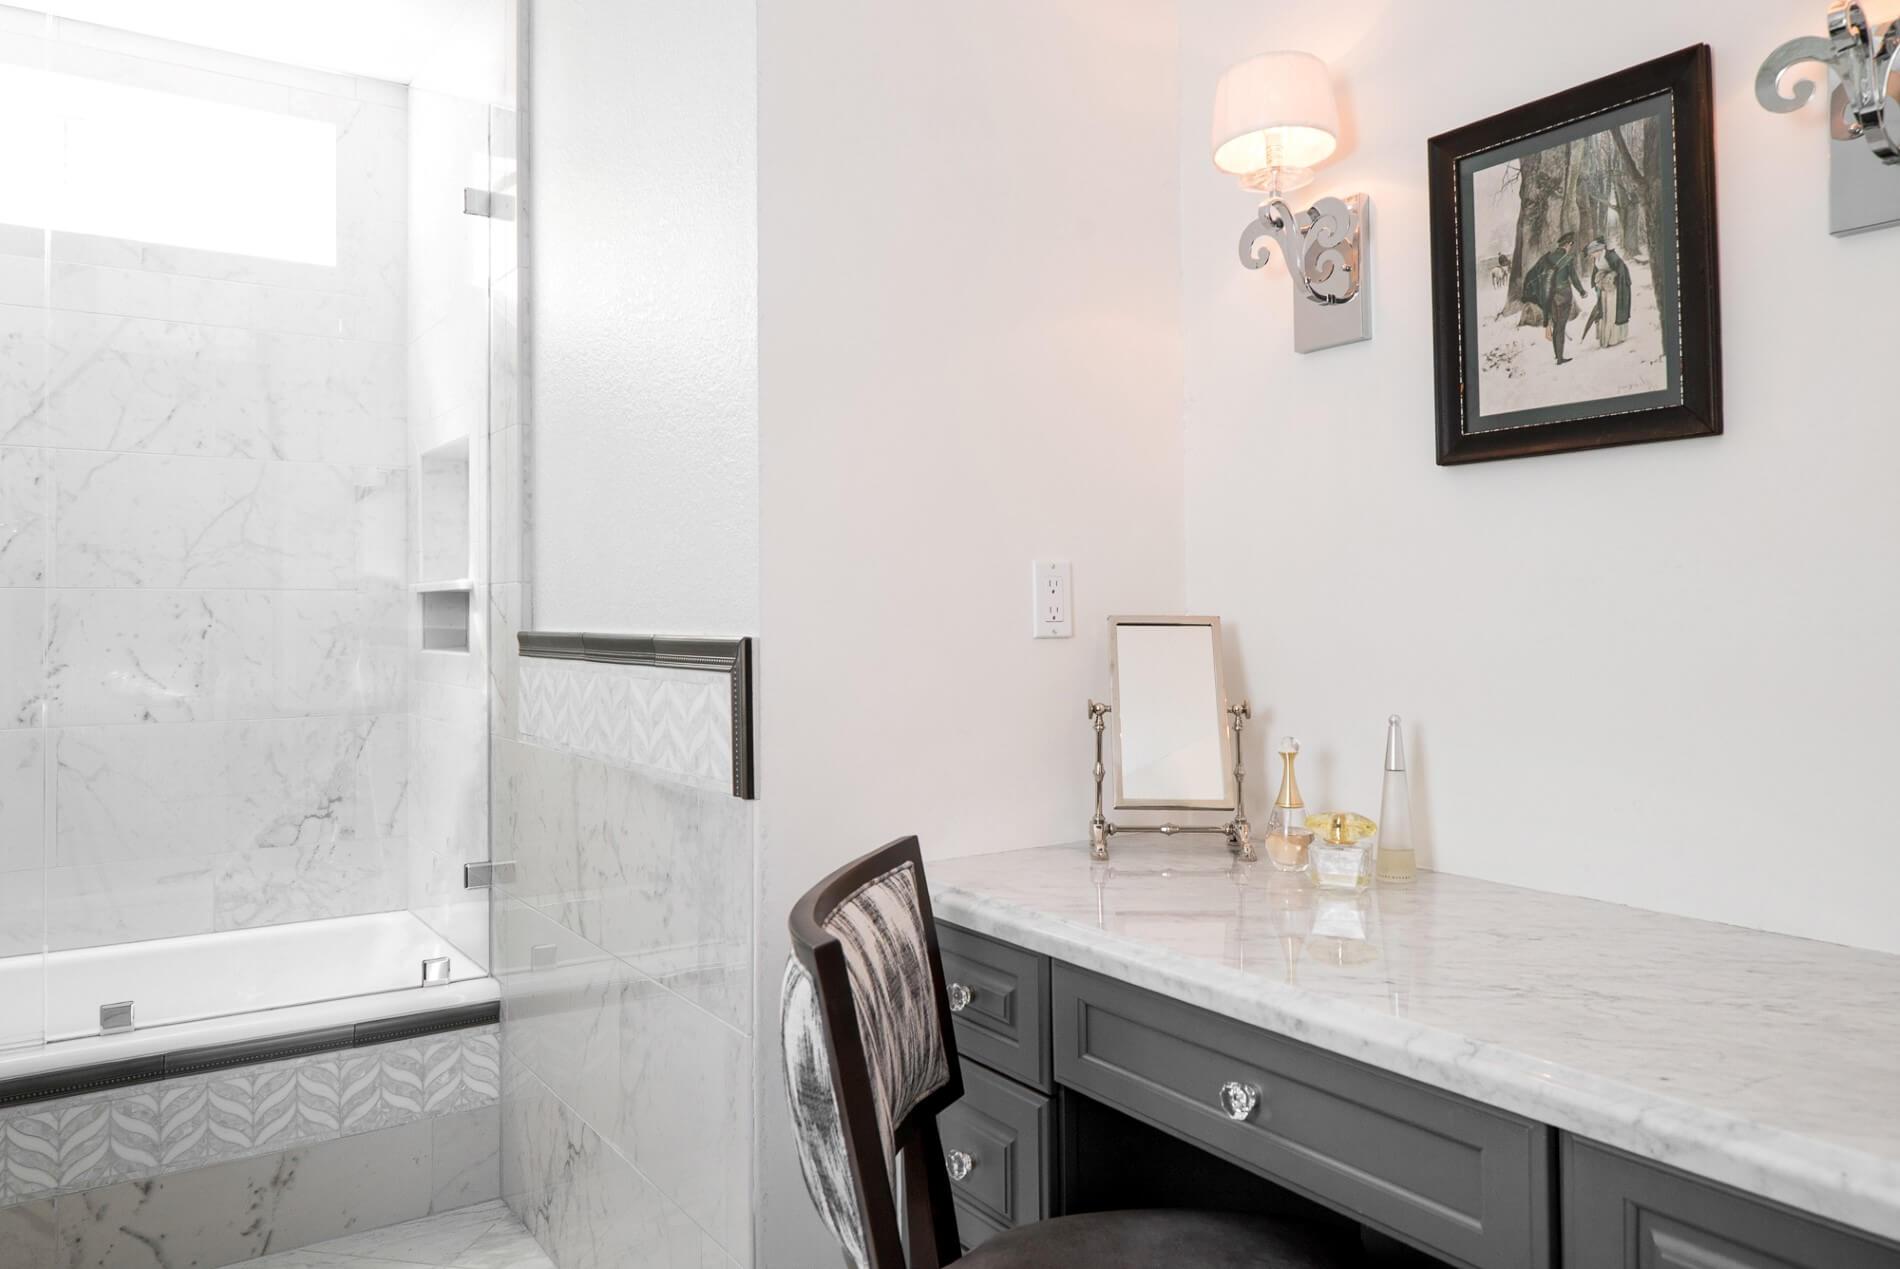 Luxury Master Bathroom, Luxury Master Bathroom Vanity, Master Bathroom Vanity Design